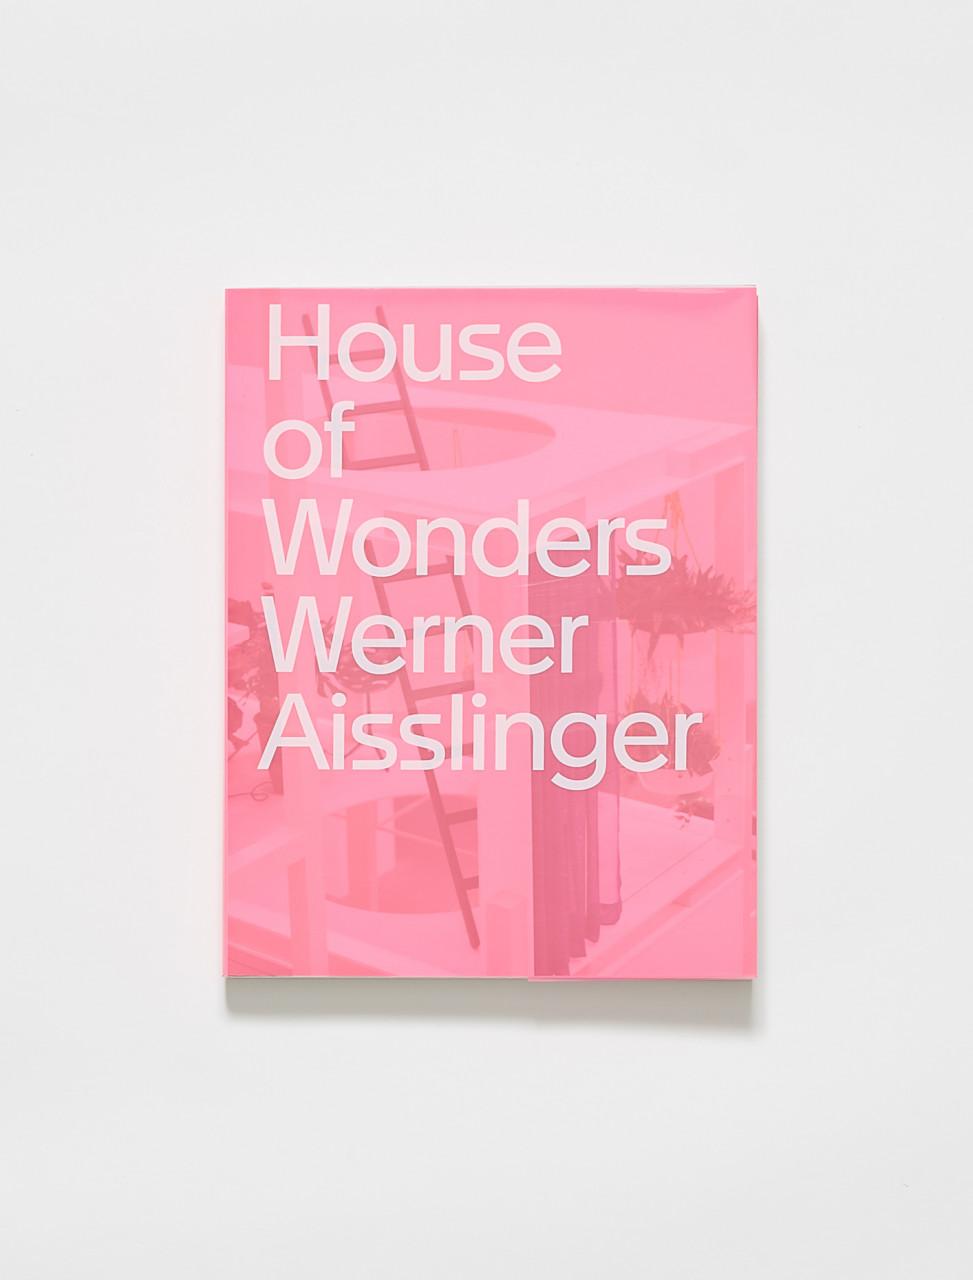 9783960981572 HOUSE OF WONDERS WERNER AISSINGER